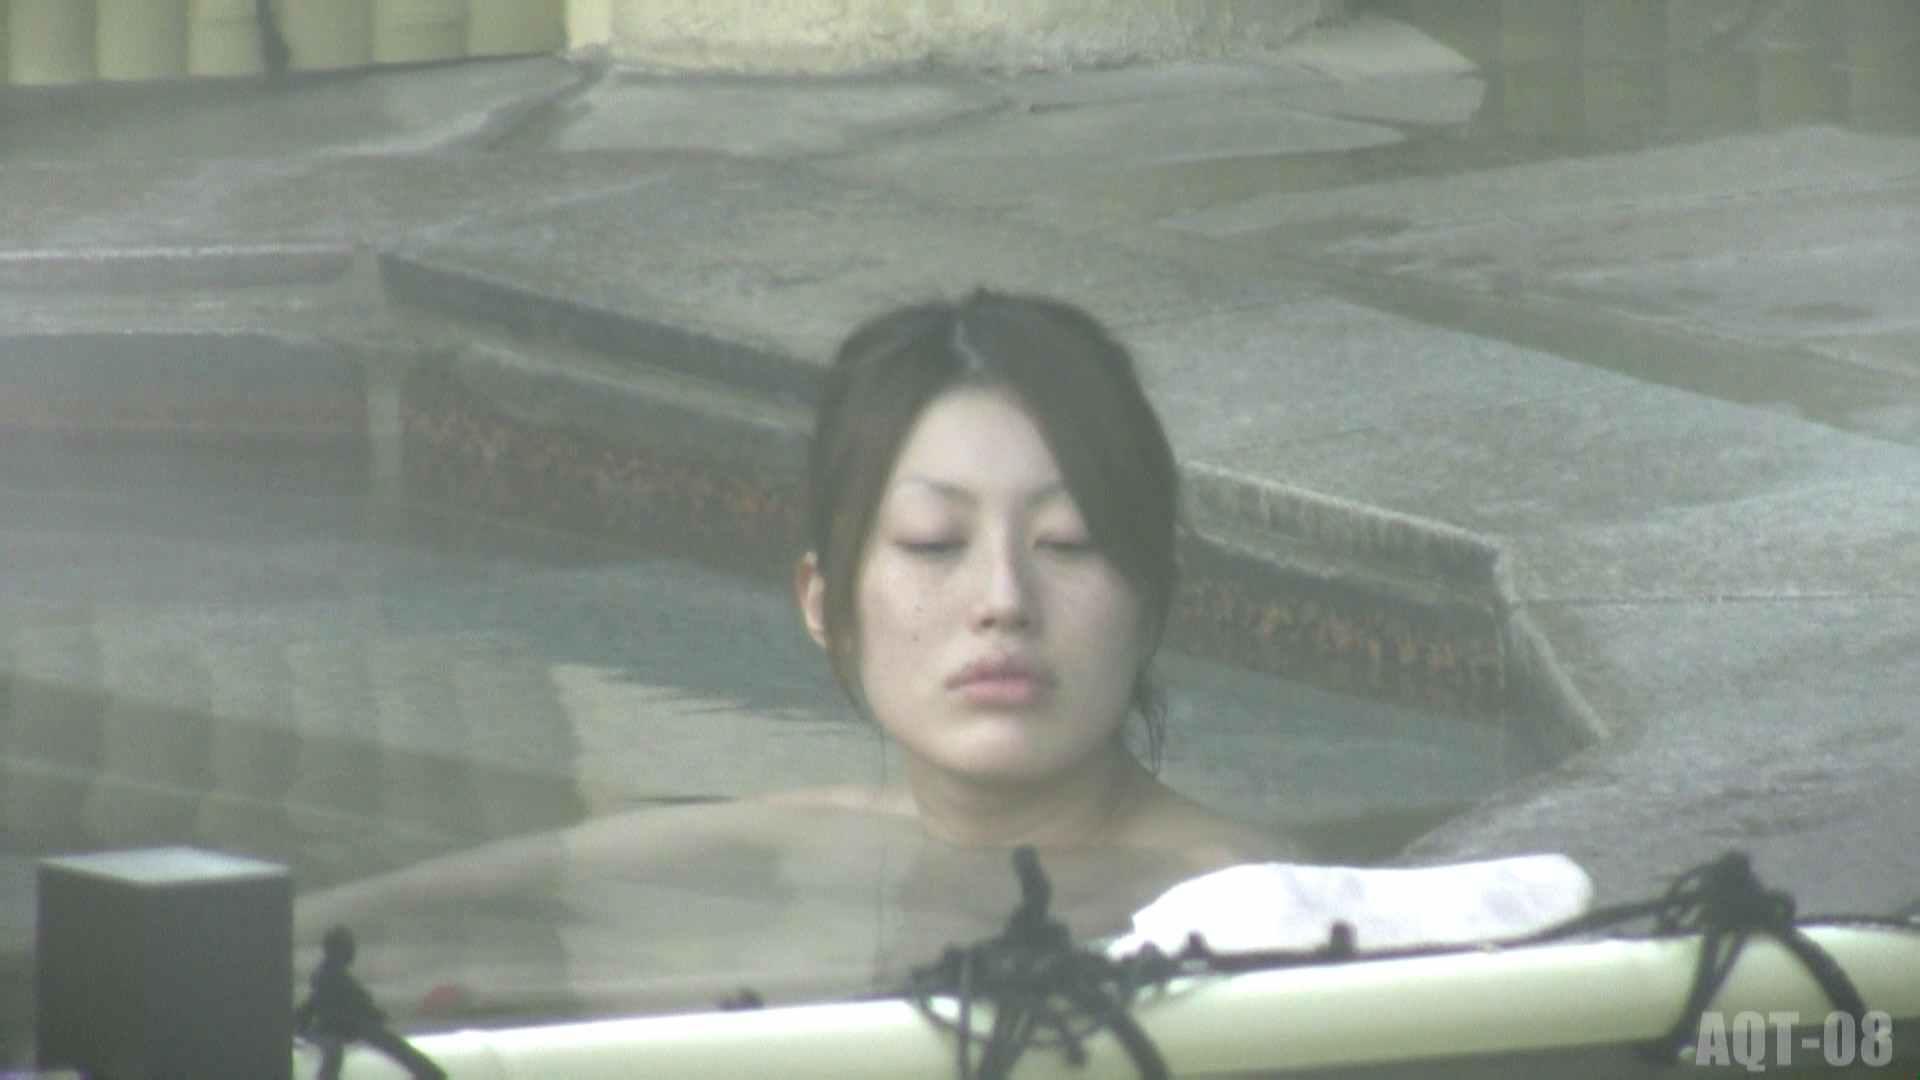 Aquaな露天風呂Vol.775 盗撮師作品 AV無料動画キャプチャ 98pic 68